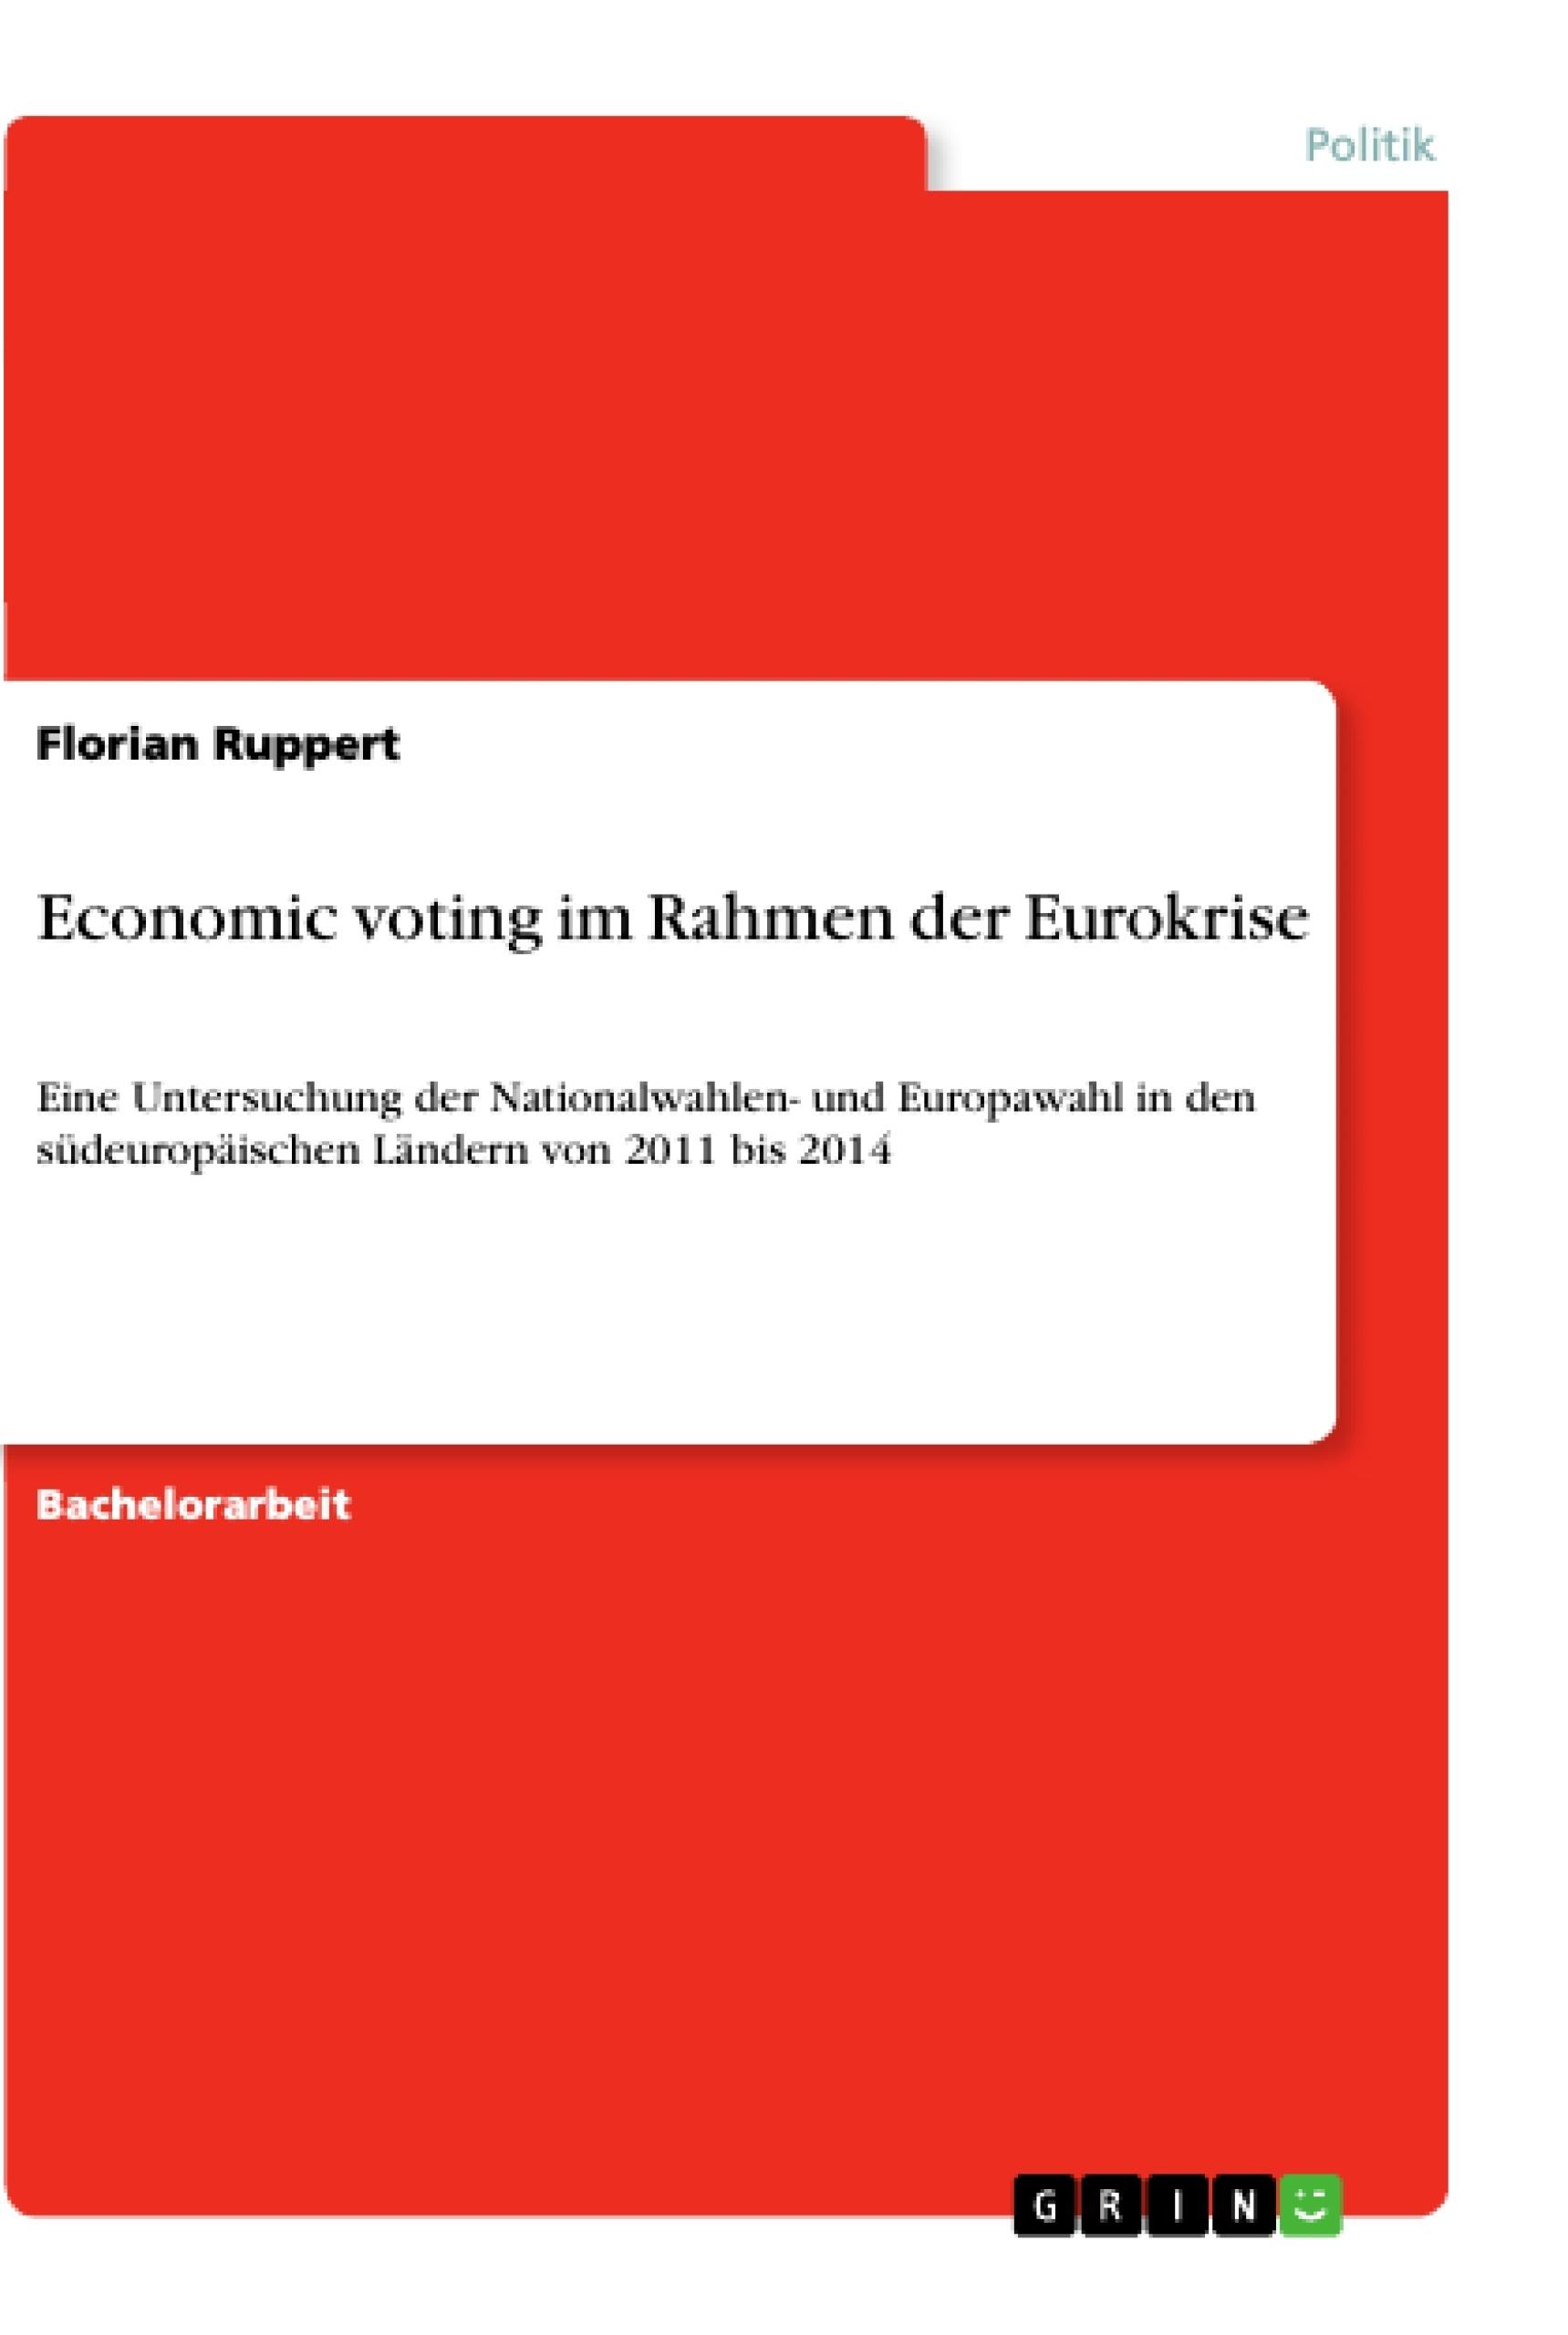 Titel: Economic voting im Rahmen der Eurokrise